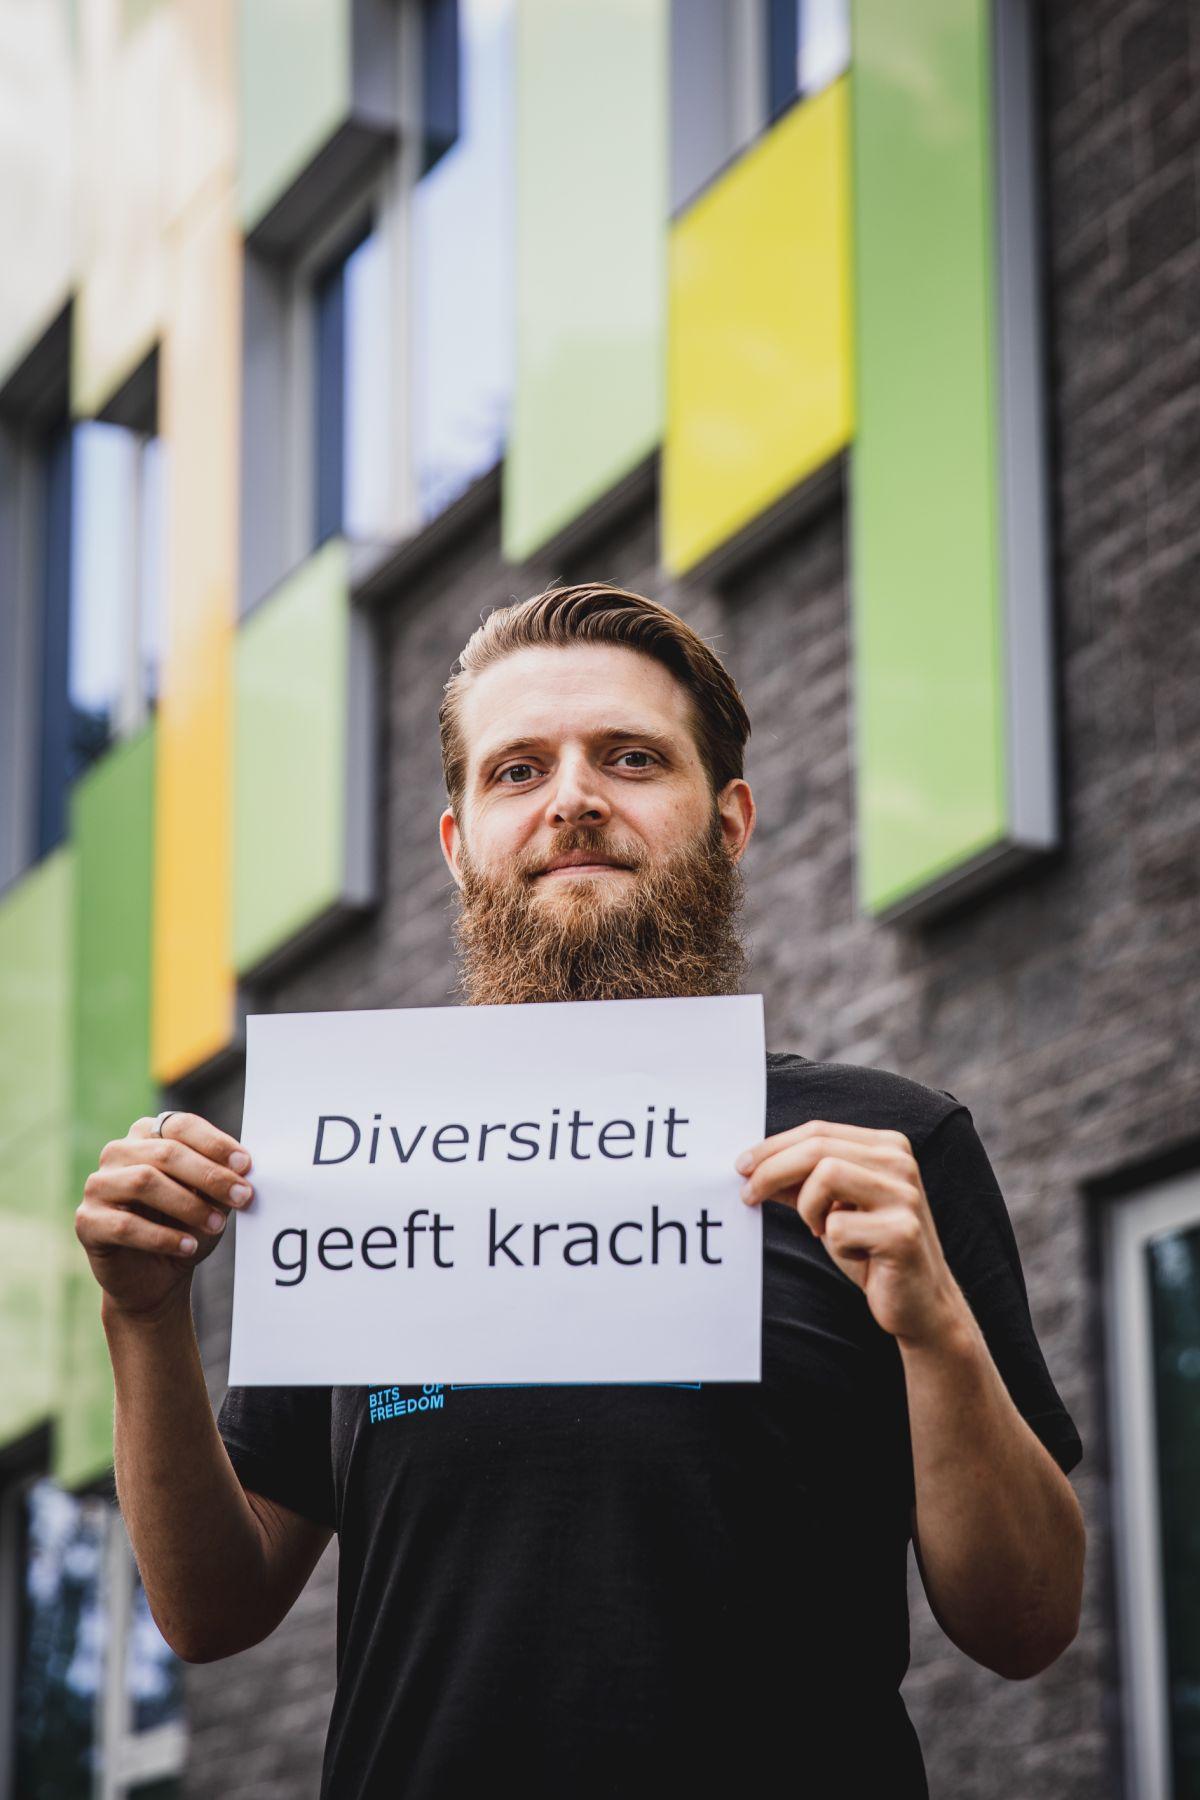 'Diversiteit geeft kracht'